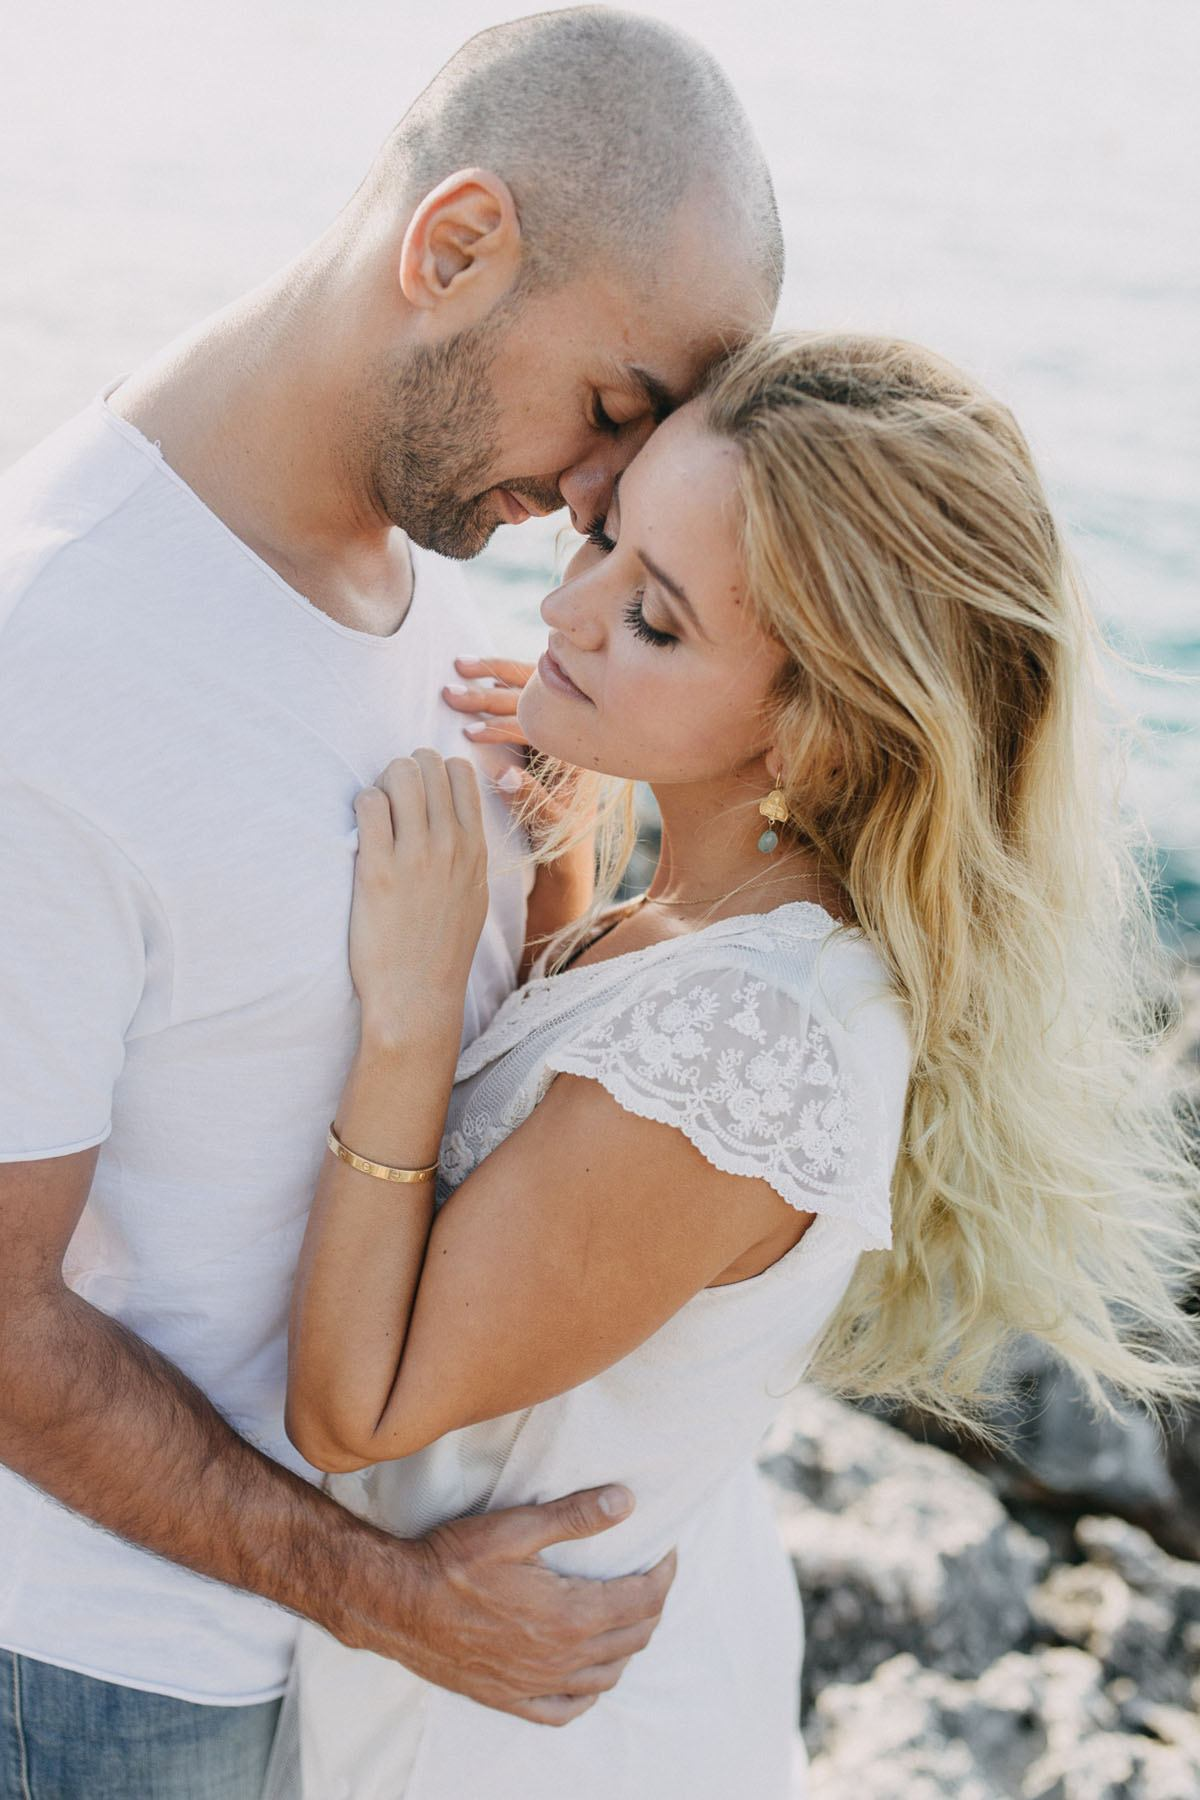 cala d or elopement photographer - Photographer Cala d'Or | Intimate couple photo shoot in Mallorca